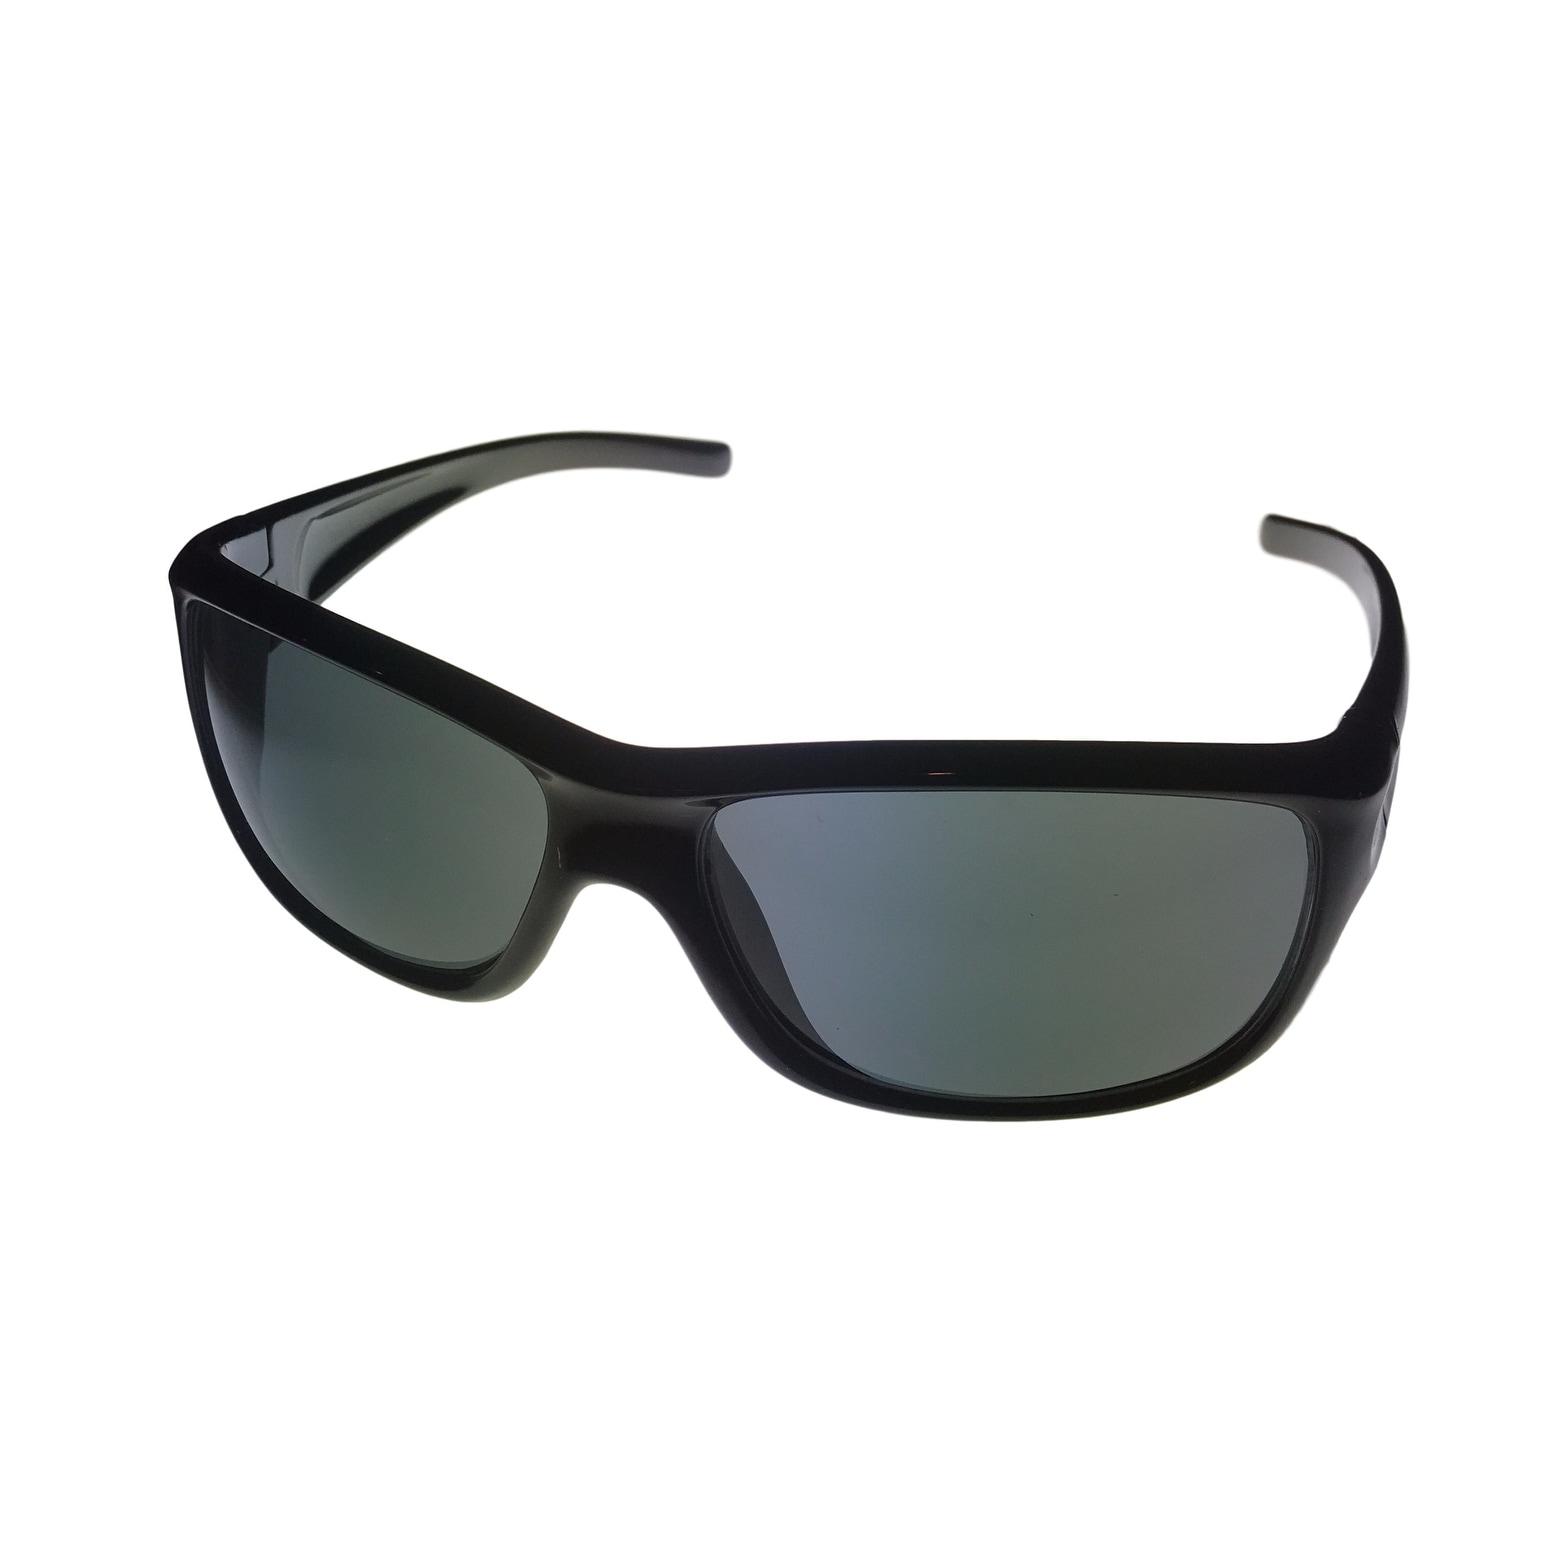 cb2ea2de421 Shop Perry Ellis Mens Sunglass PE02 1 Black Rectangle Plastic Wrap ...